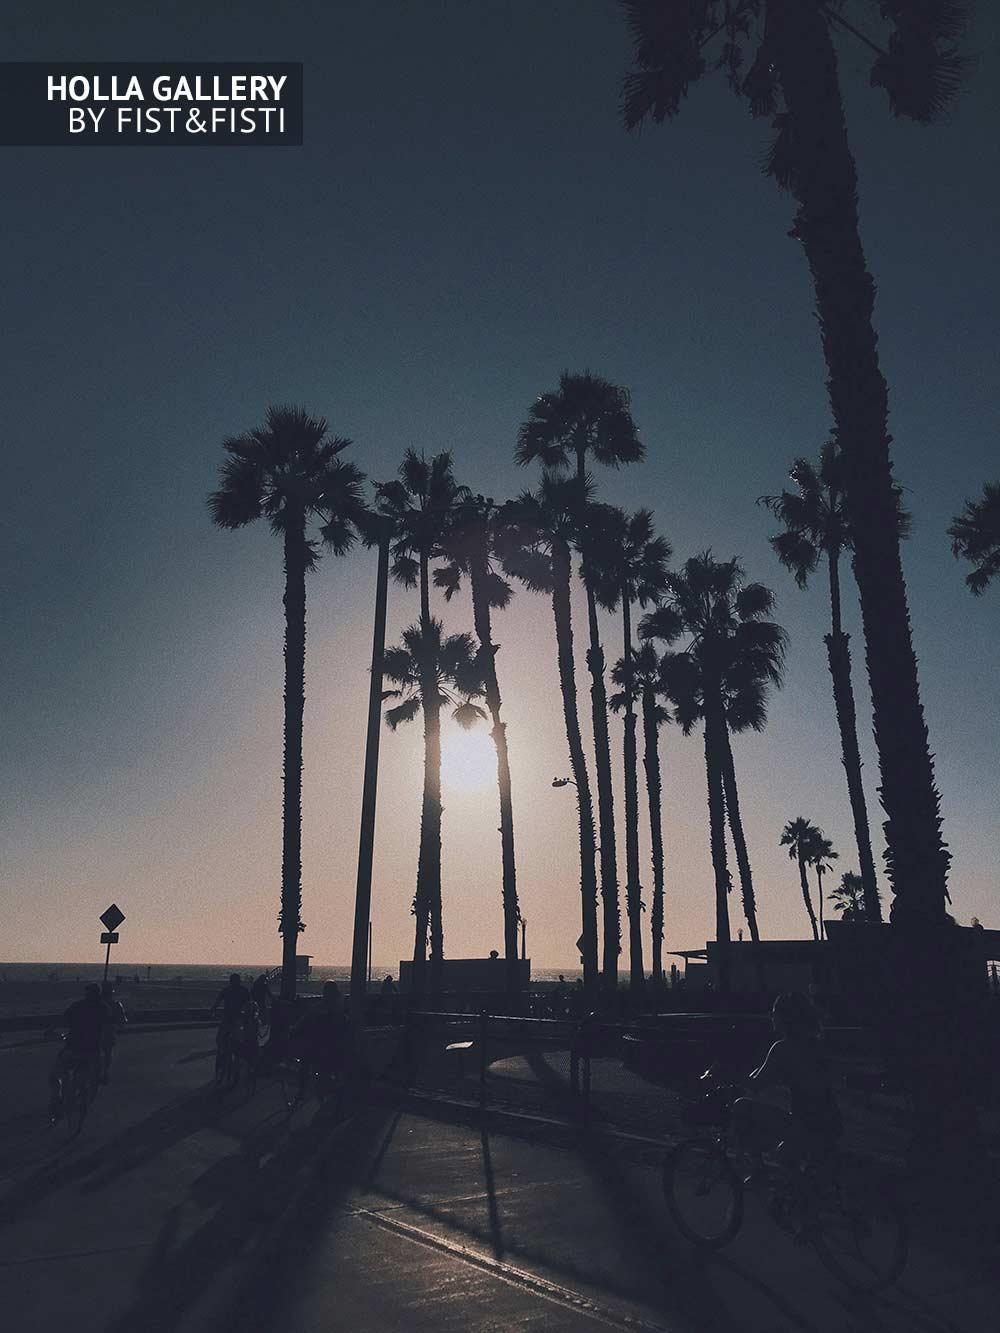 Santa Monica, Venice, пальмы, закат, солнце, велосипеды, пляж